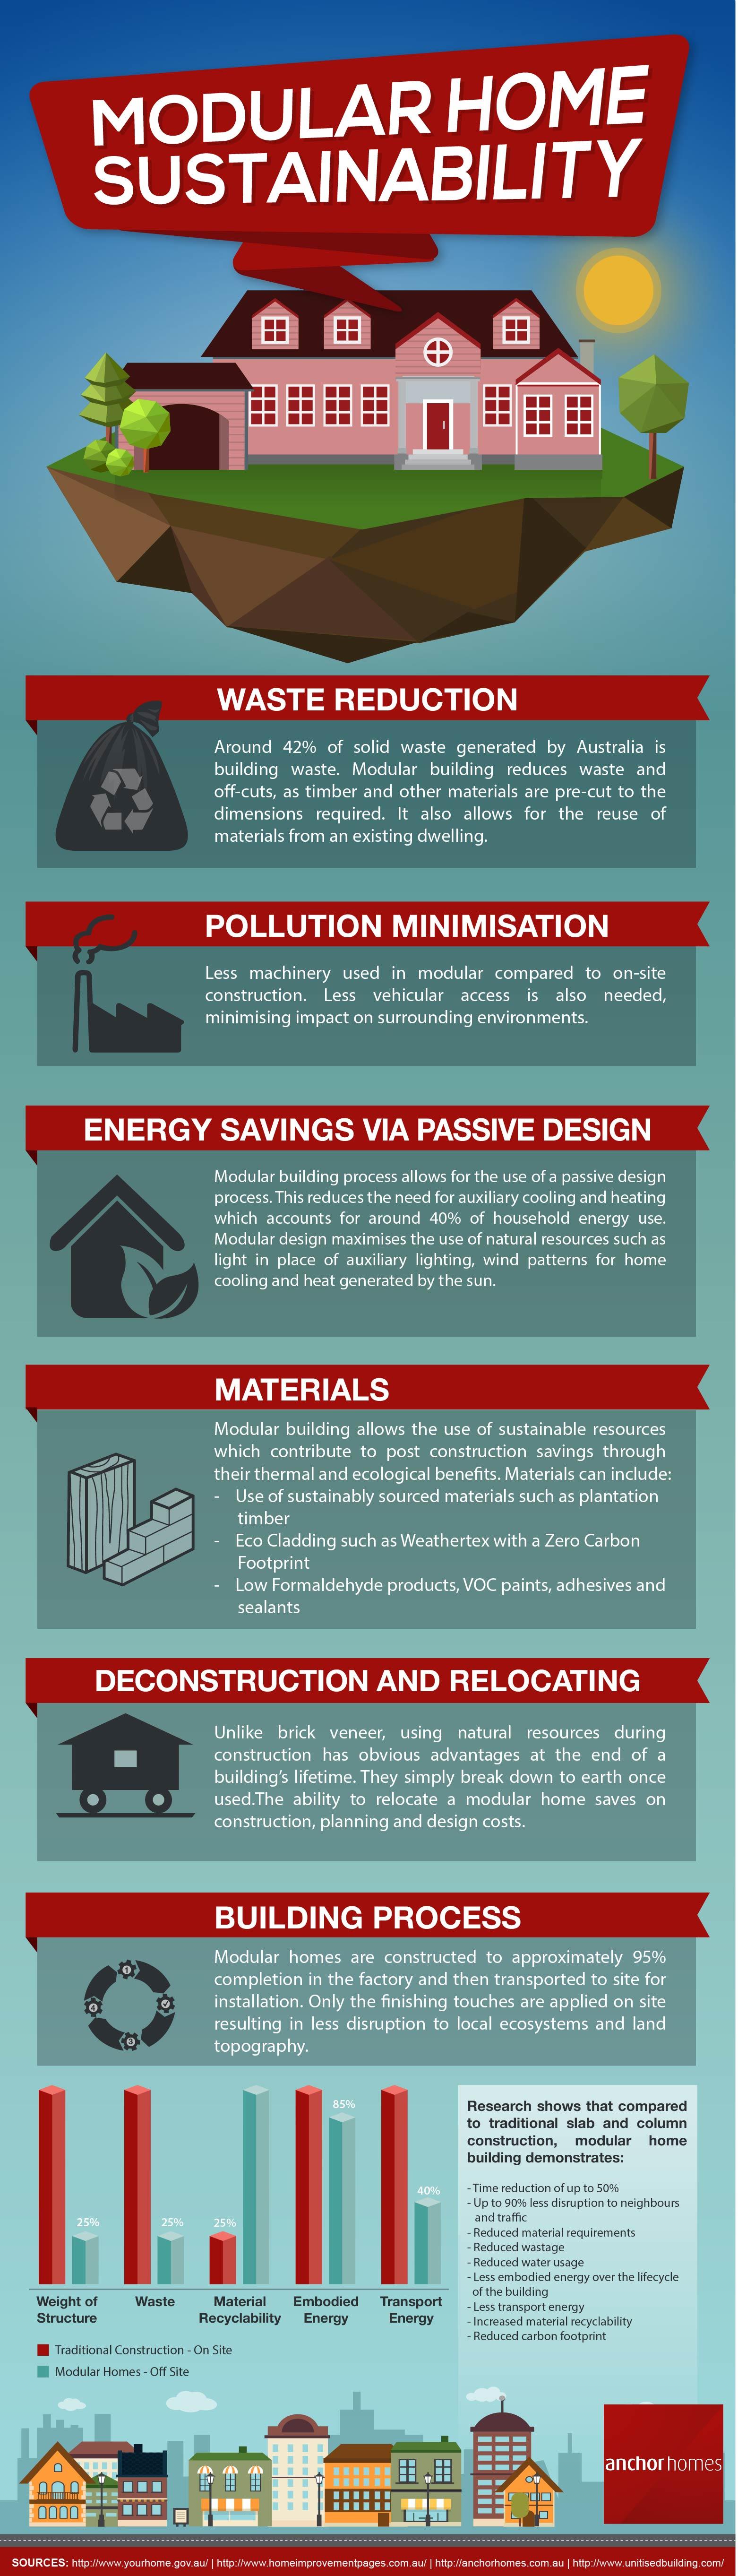 modular-home-sustainability-infographic